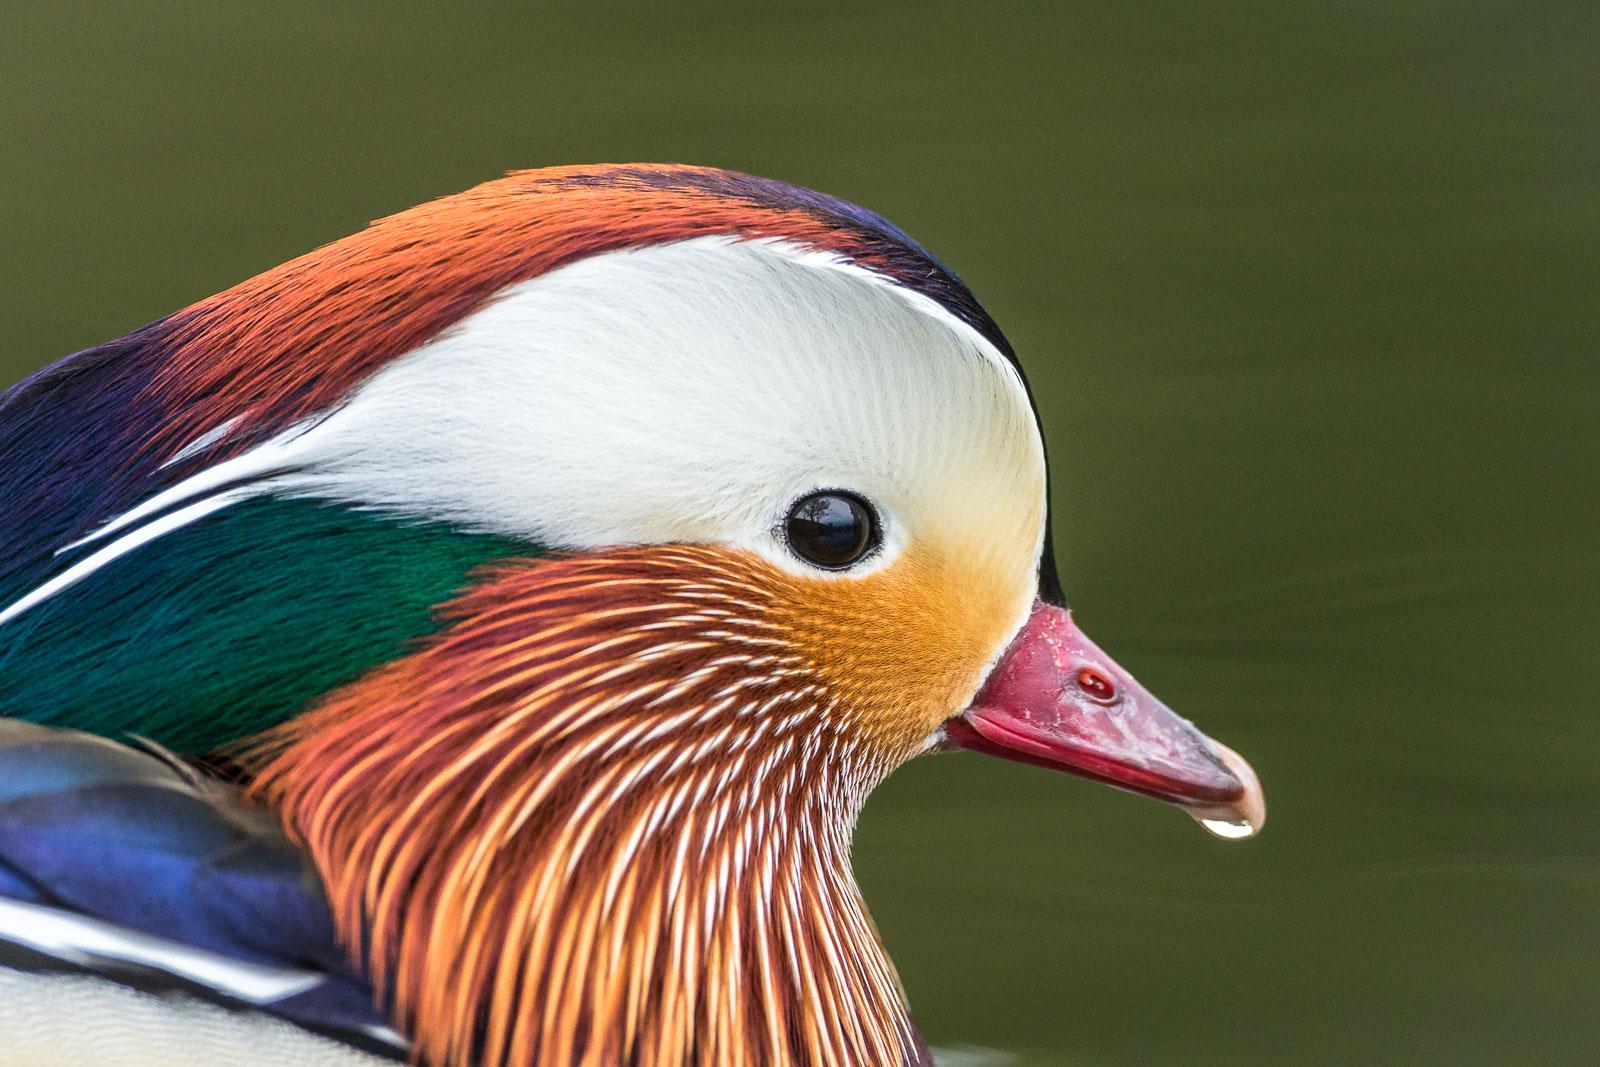 Mandarinand i profil